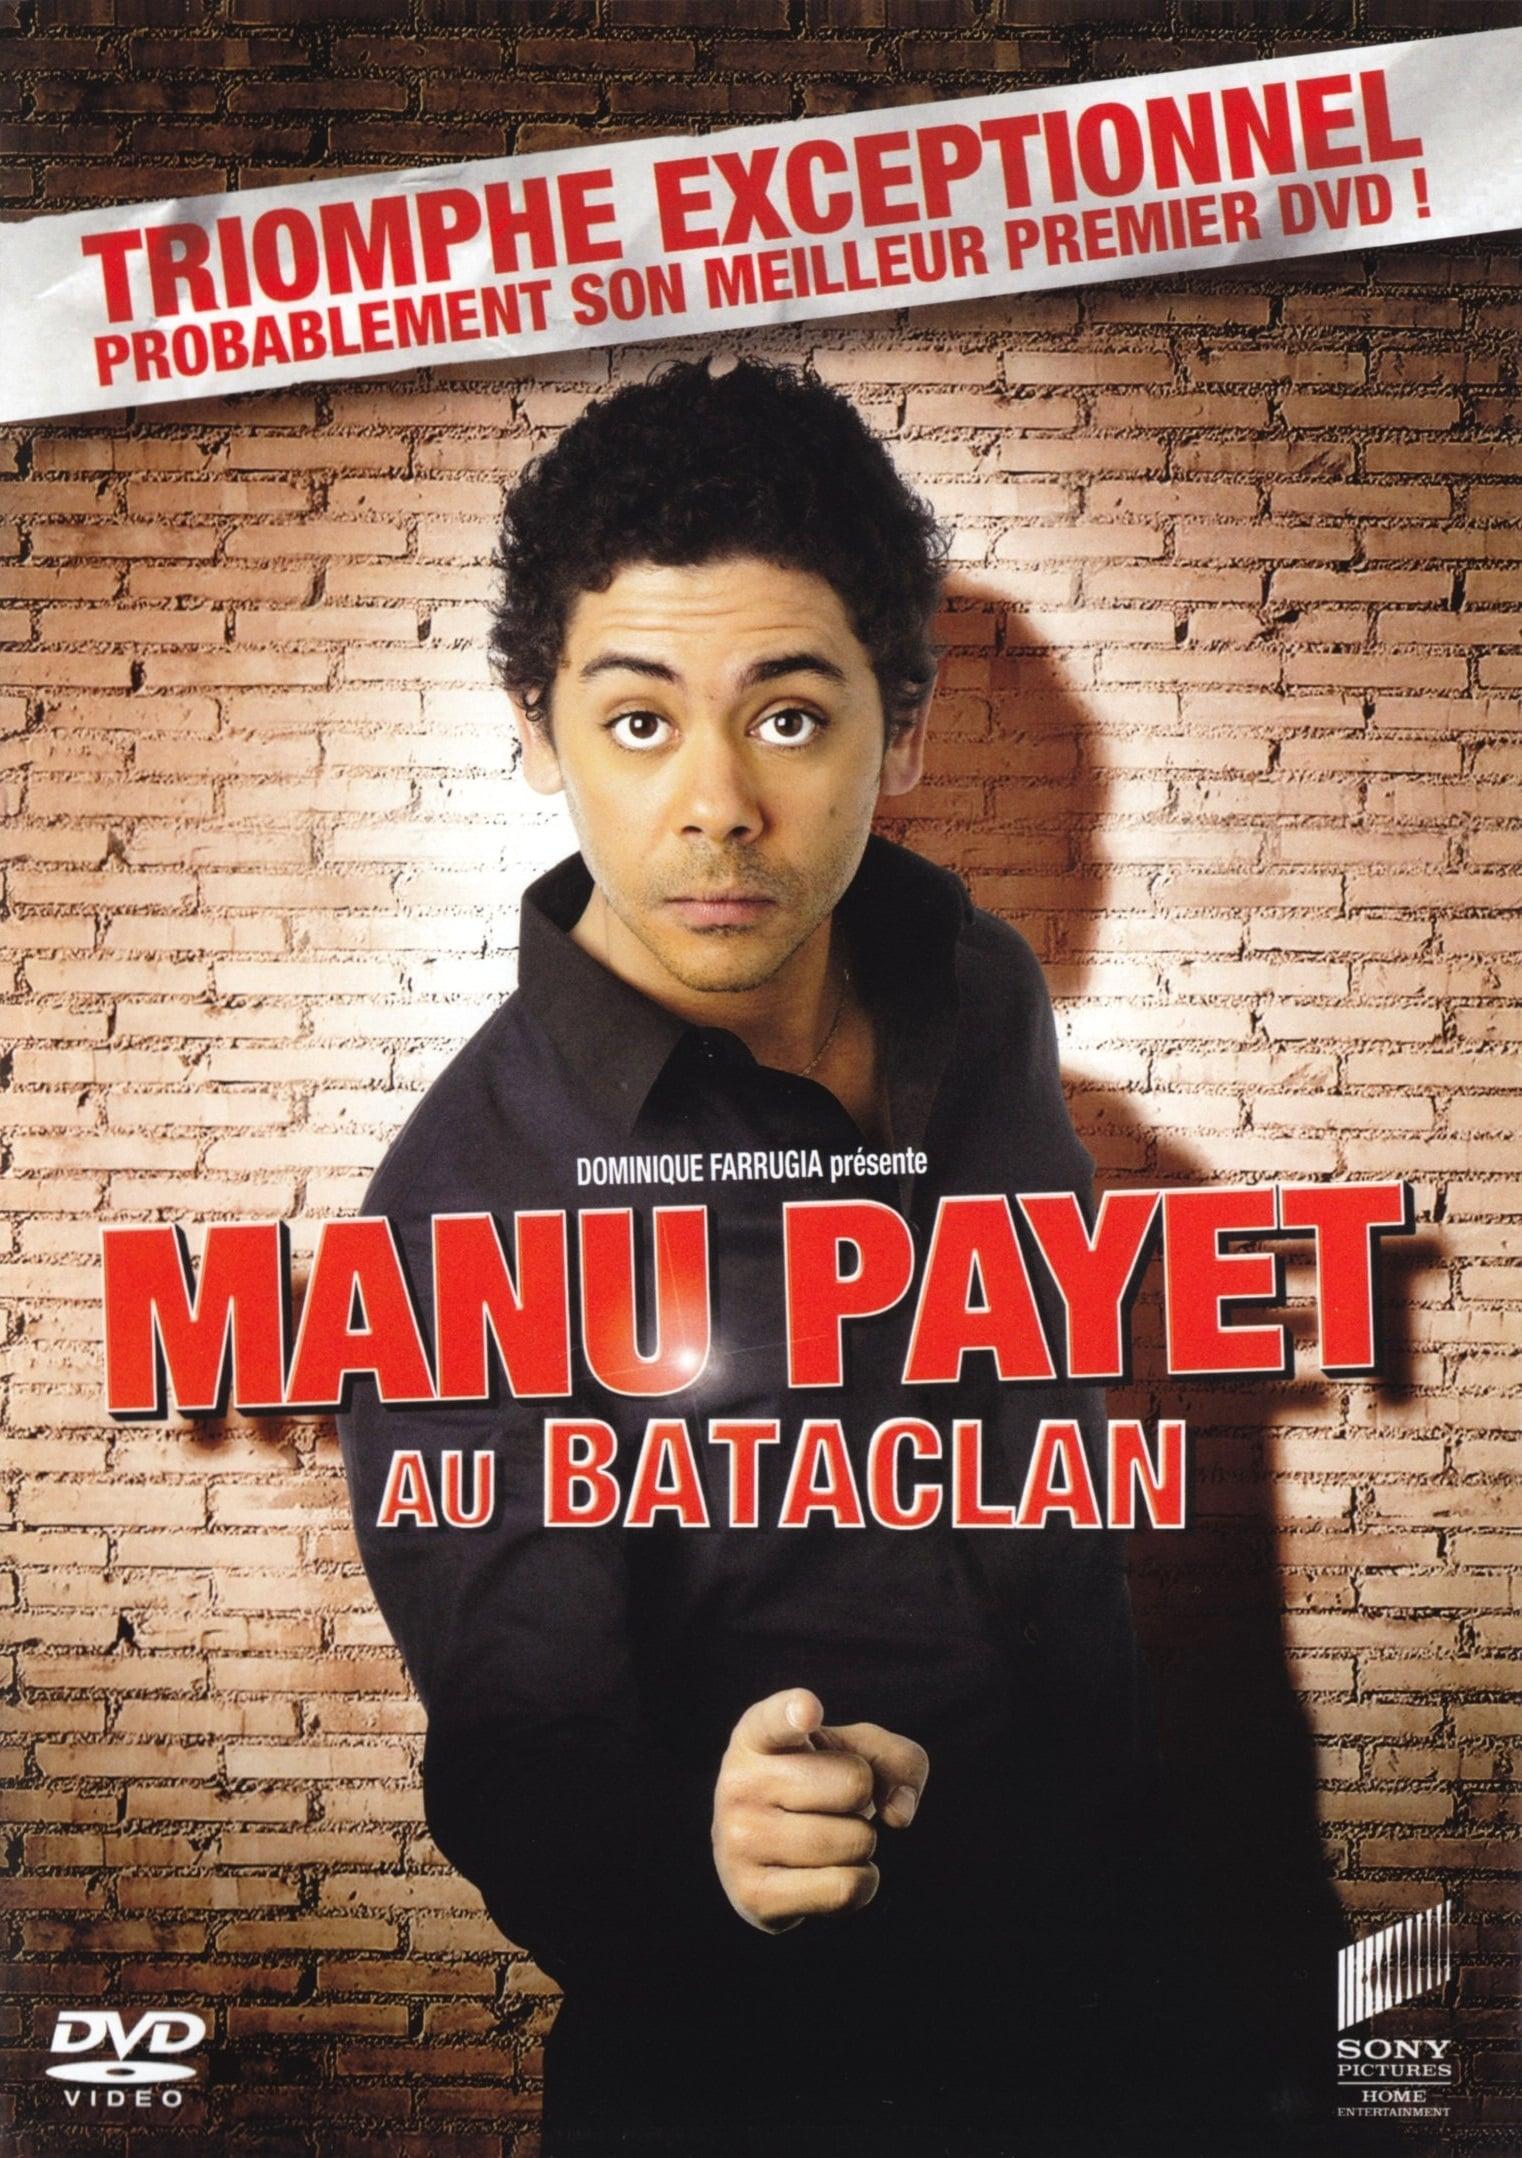 Manu Payet au Bataclan (2008)